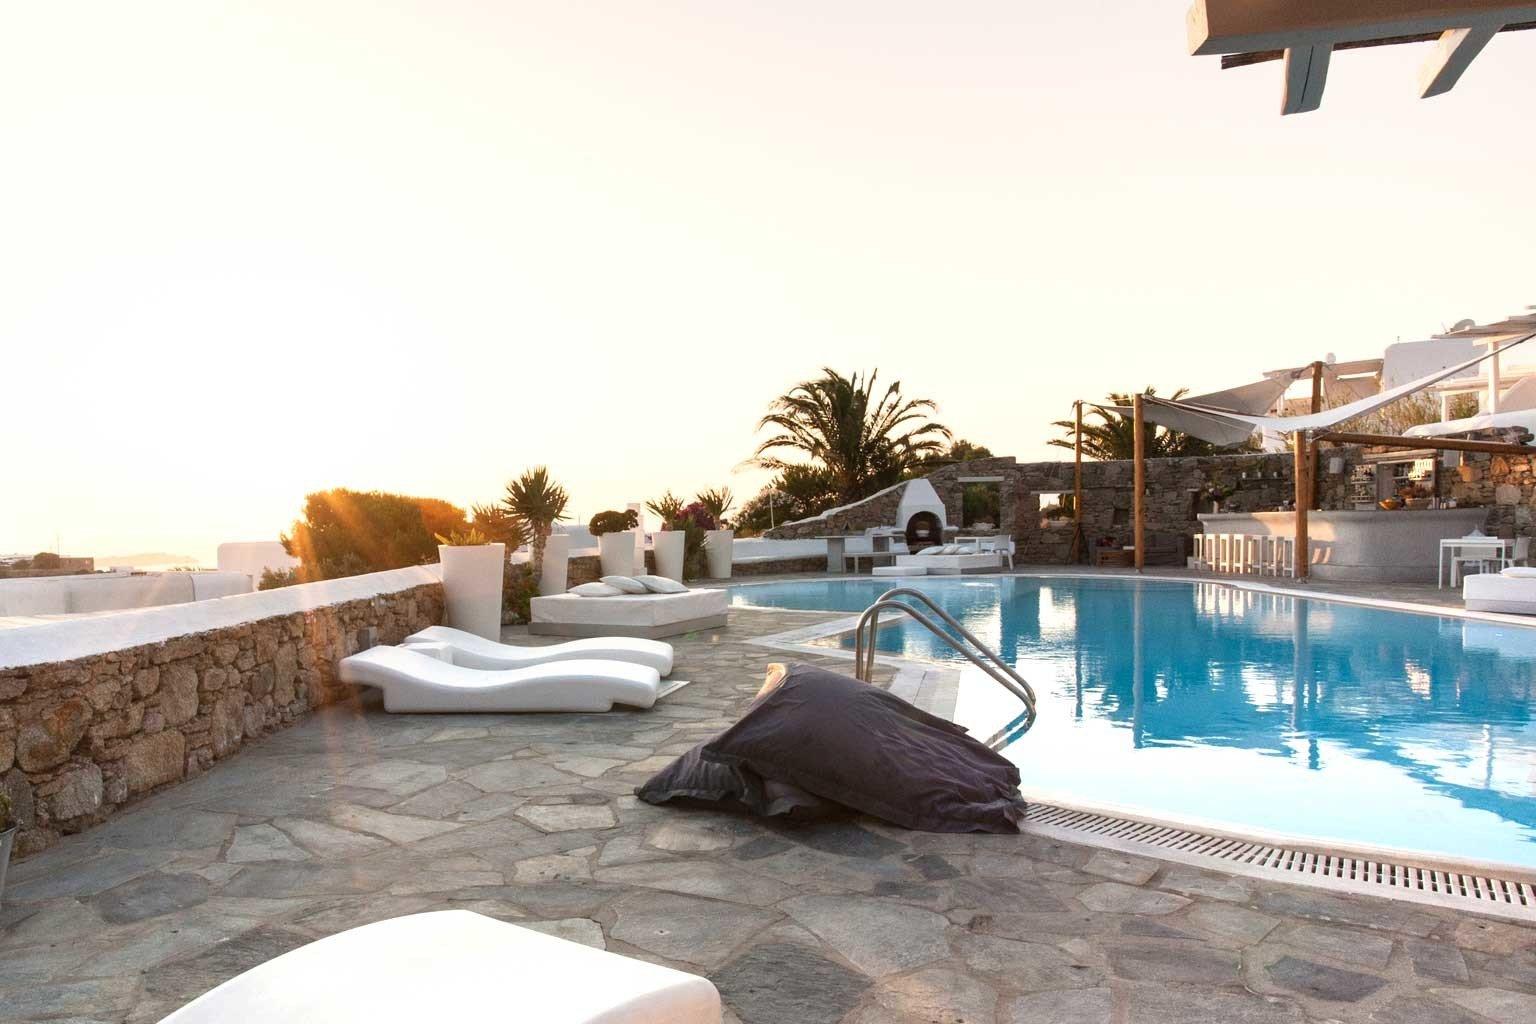 Exterior Lounge Luxury Modern Pool swimming pool property leisure Resort Villa backyard home stone